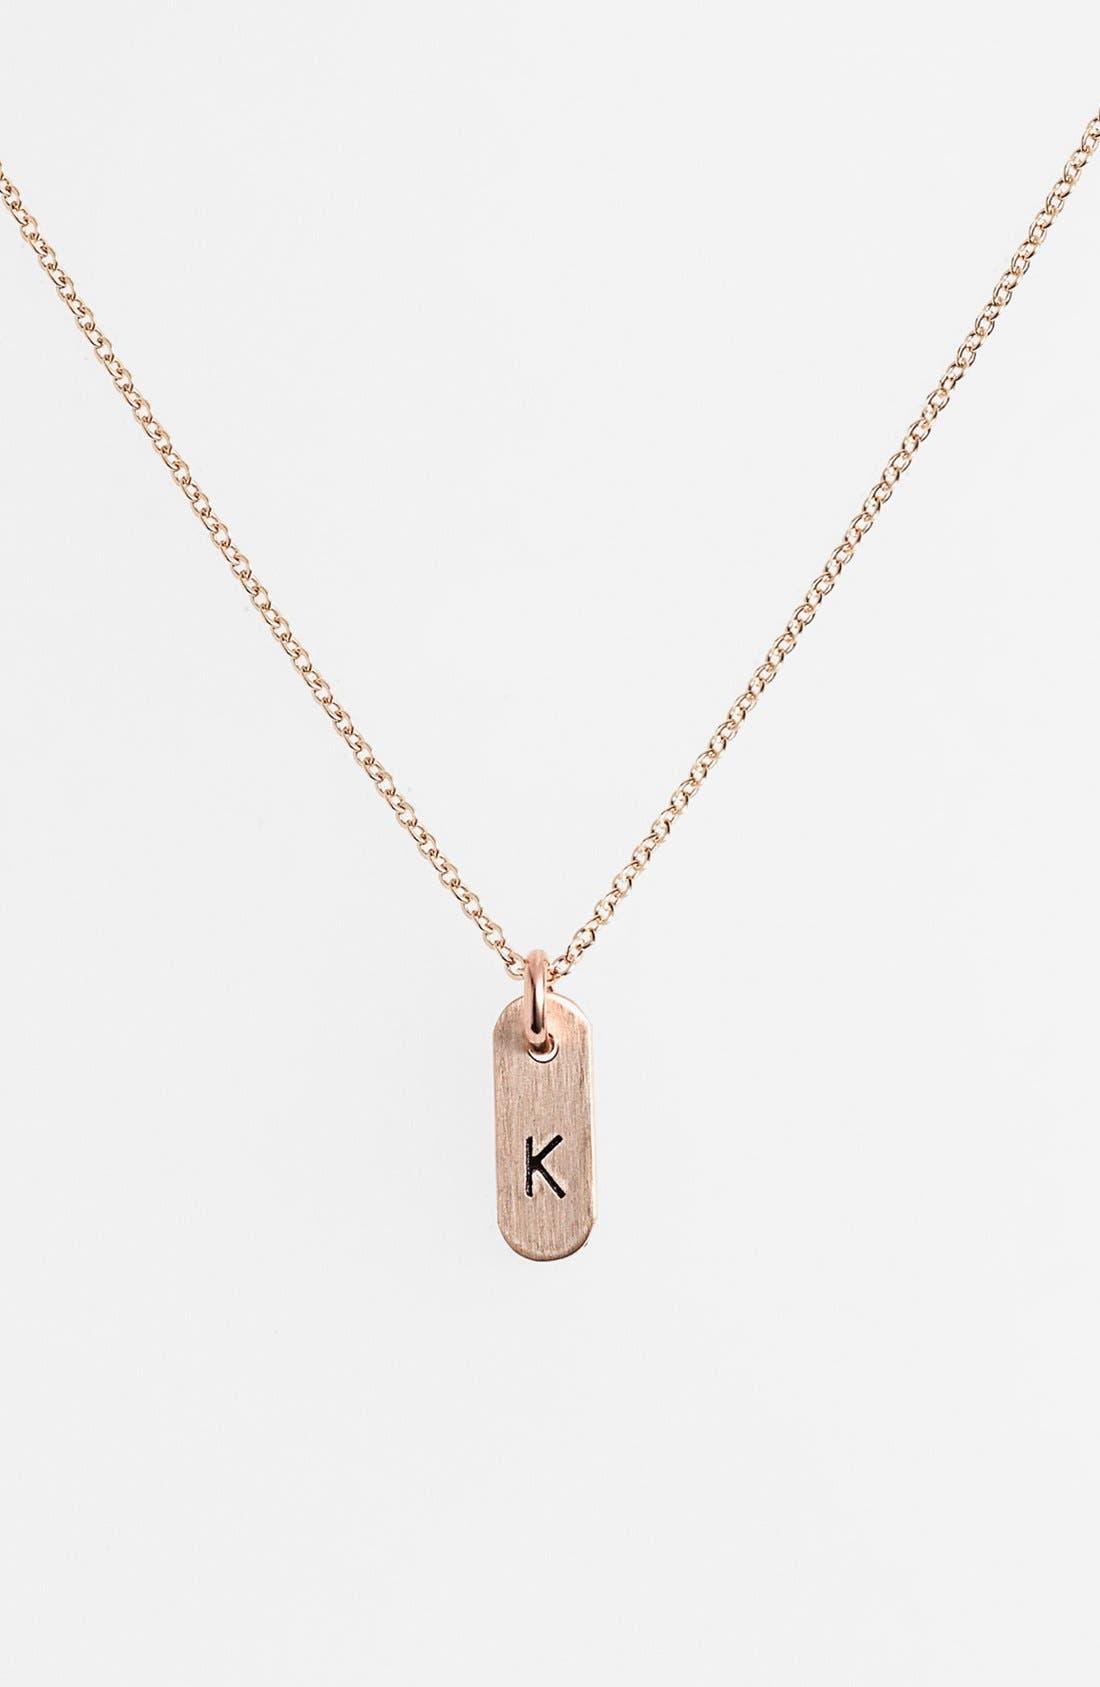 Nashelle 'Mini Initial' 14k-Gold Fill Bar Necklace